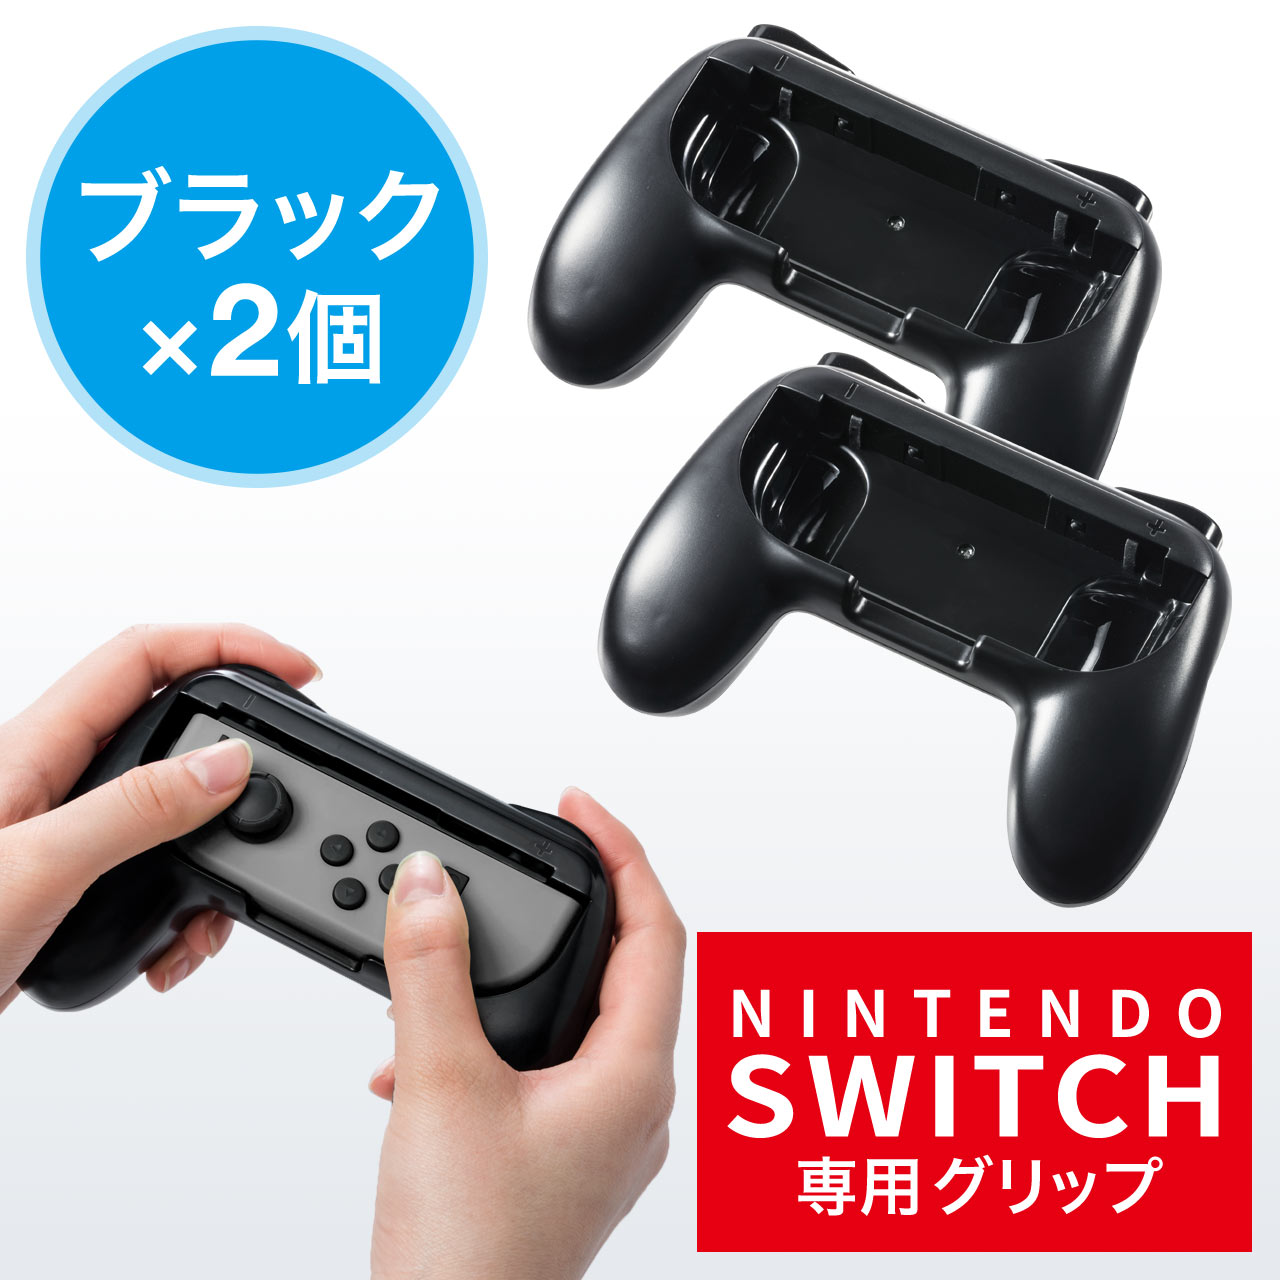 Switch スタンド ポータブル ハブ nintendo usb for